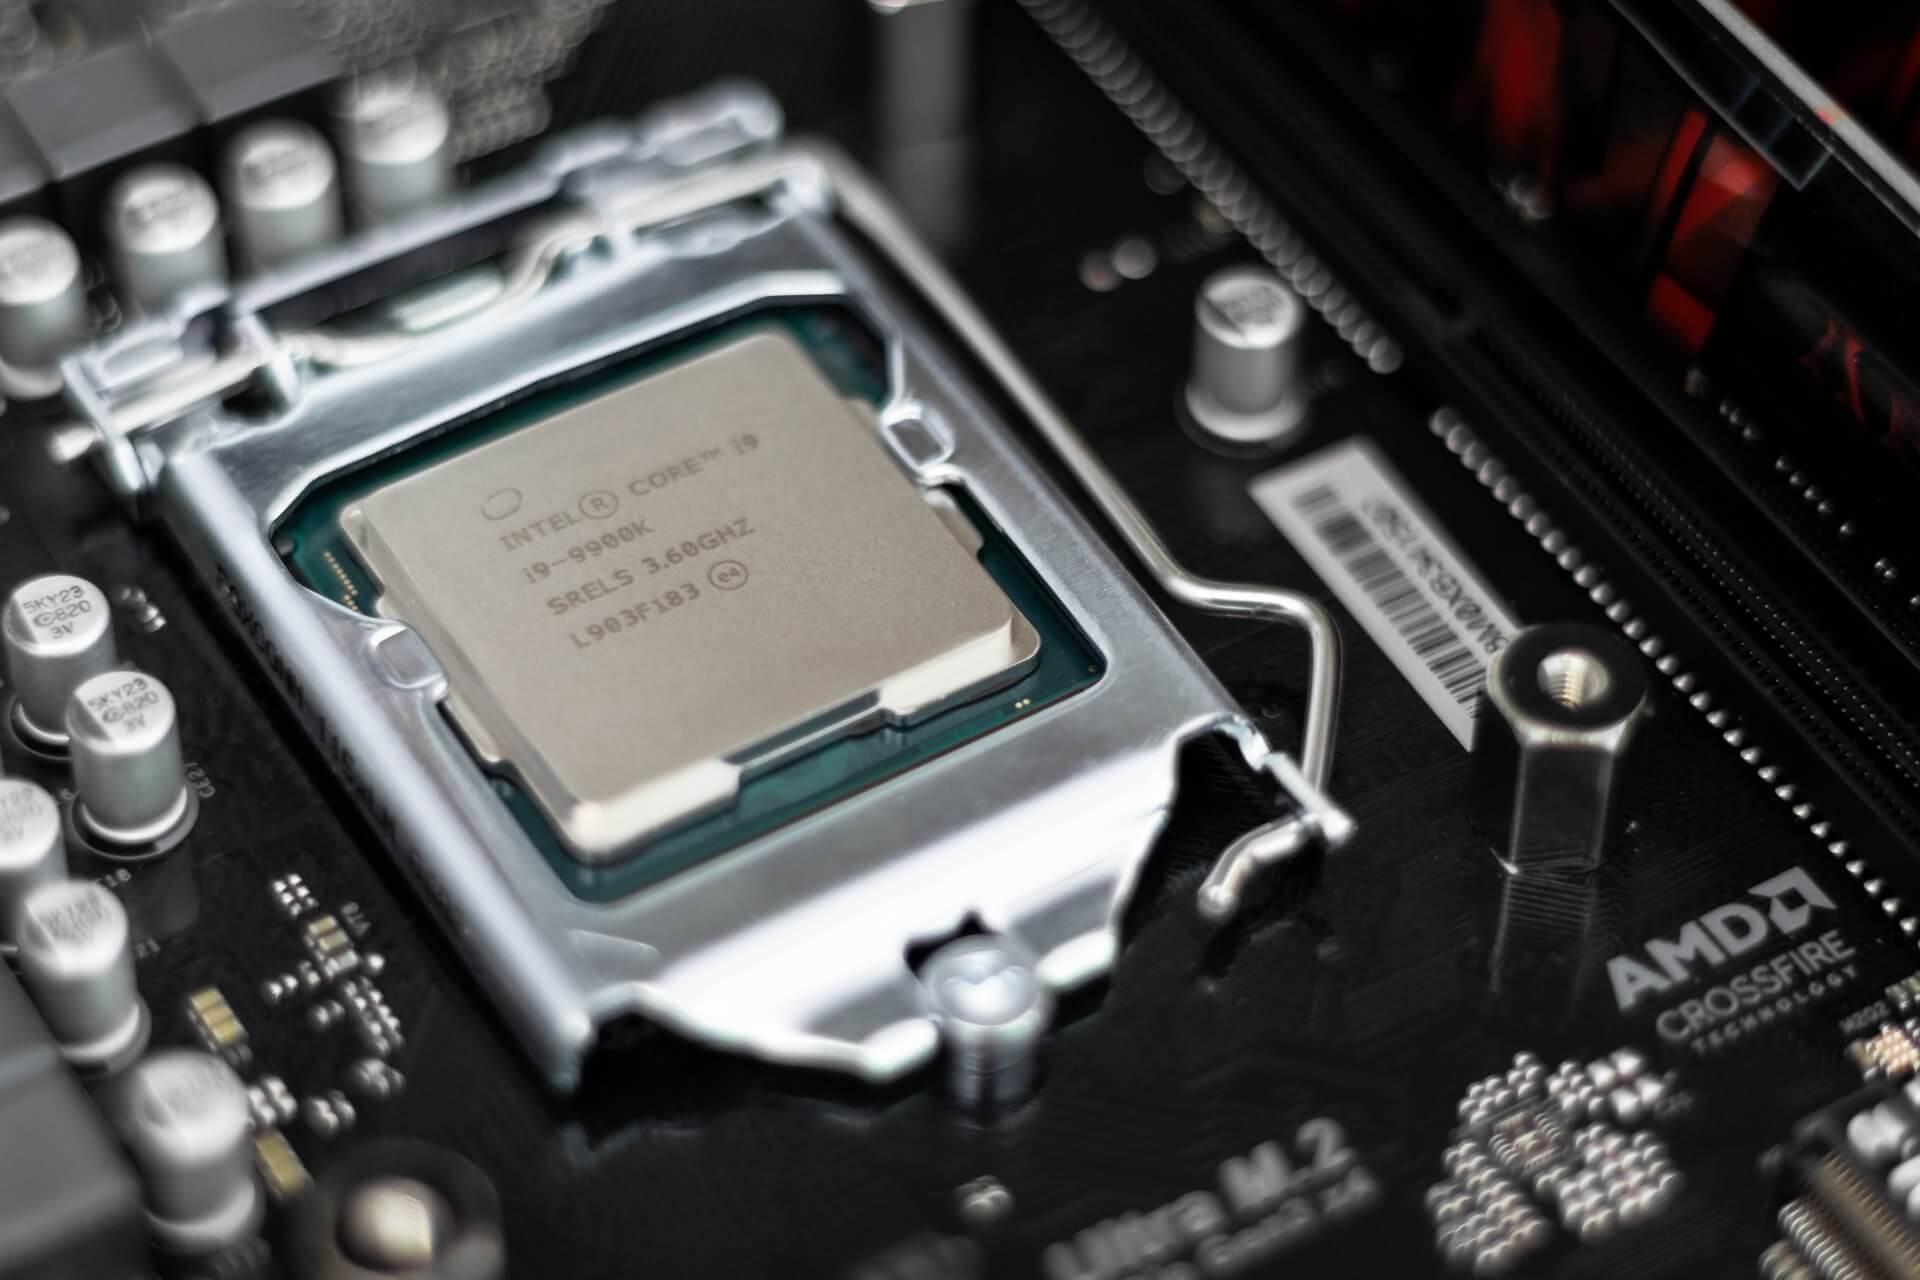 CPUの特徴とは?選び方や性能を評価するポイント、比較一覧を紹介